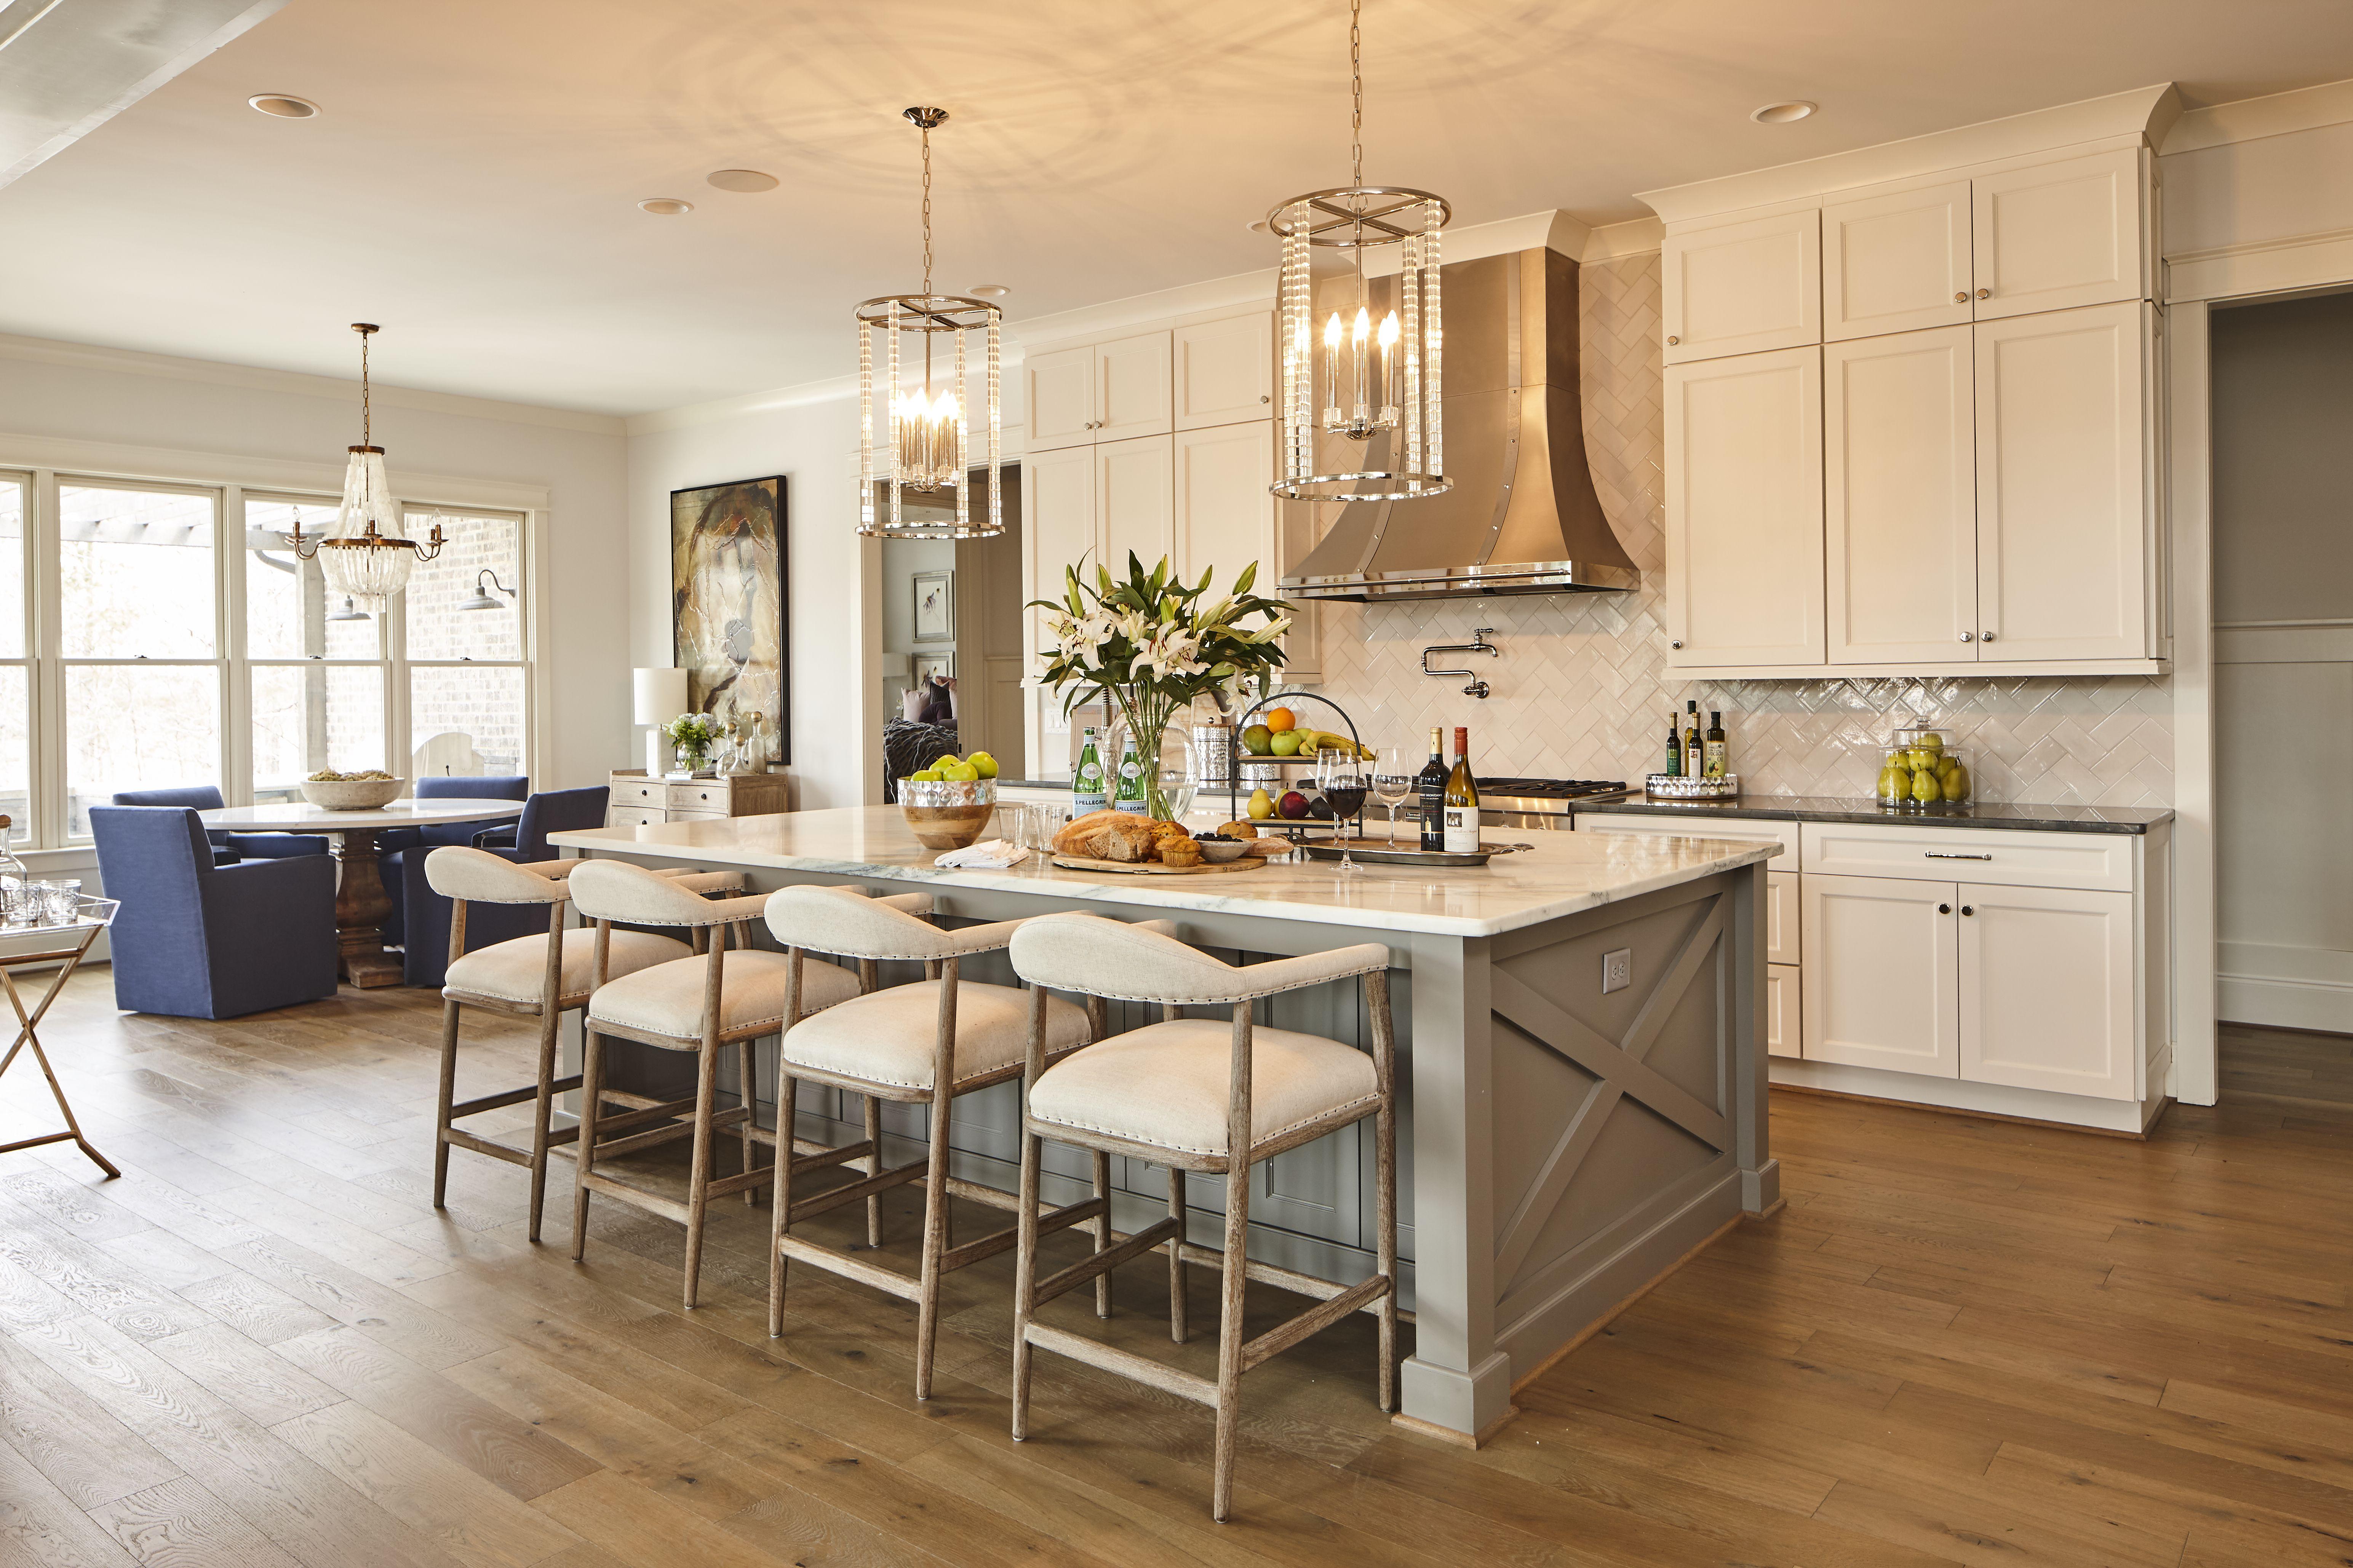 Kitchen Island Design Bar Height Or Counter Height Eastwood Homes Elegant Kitchen Island Elegant Kitchens Kitchen Pictures